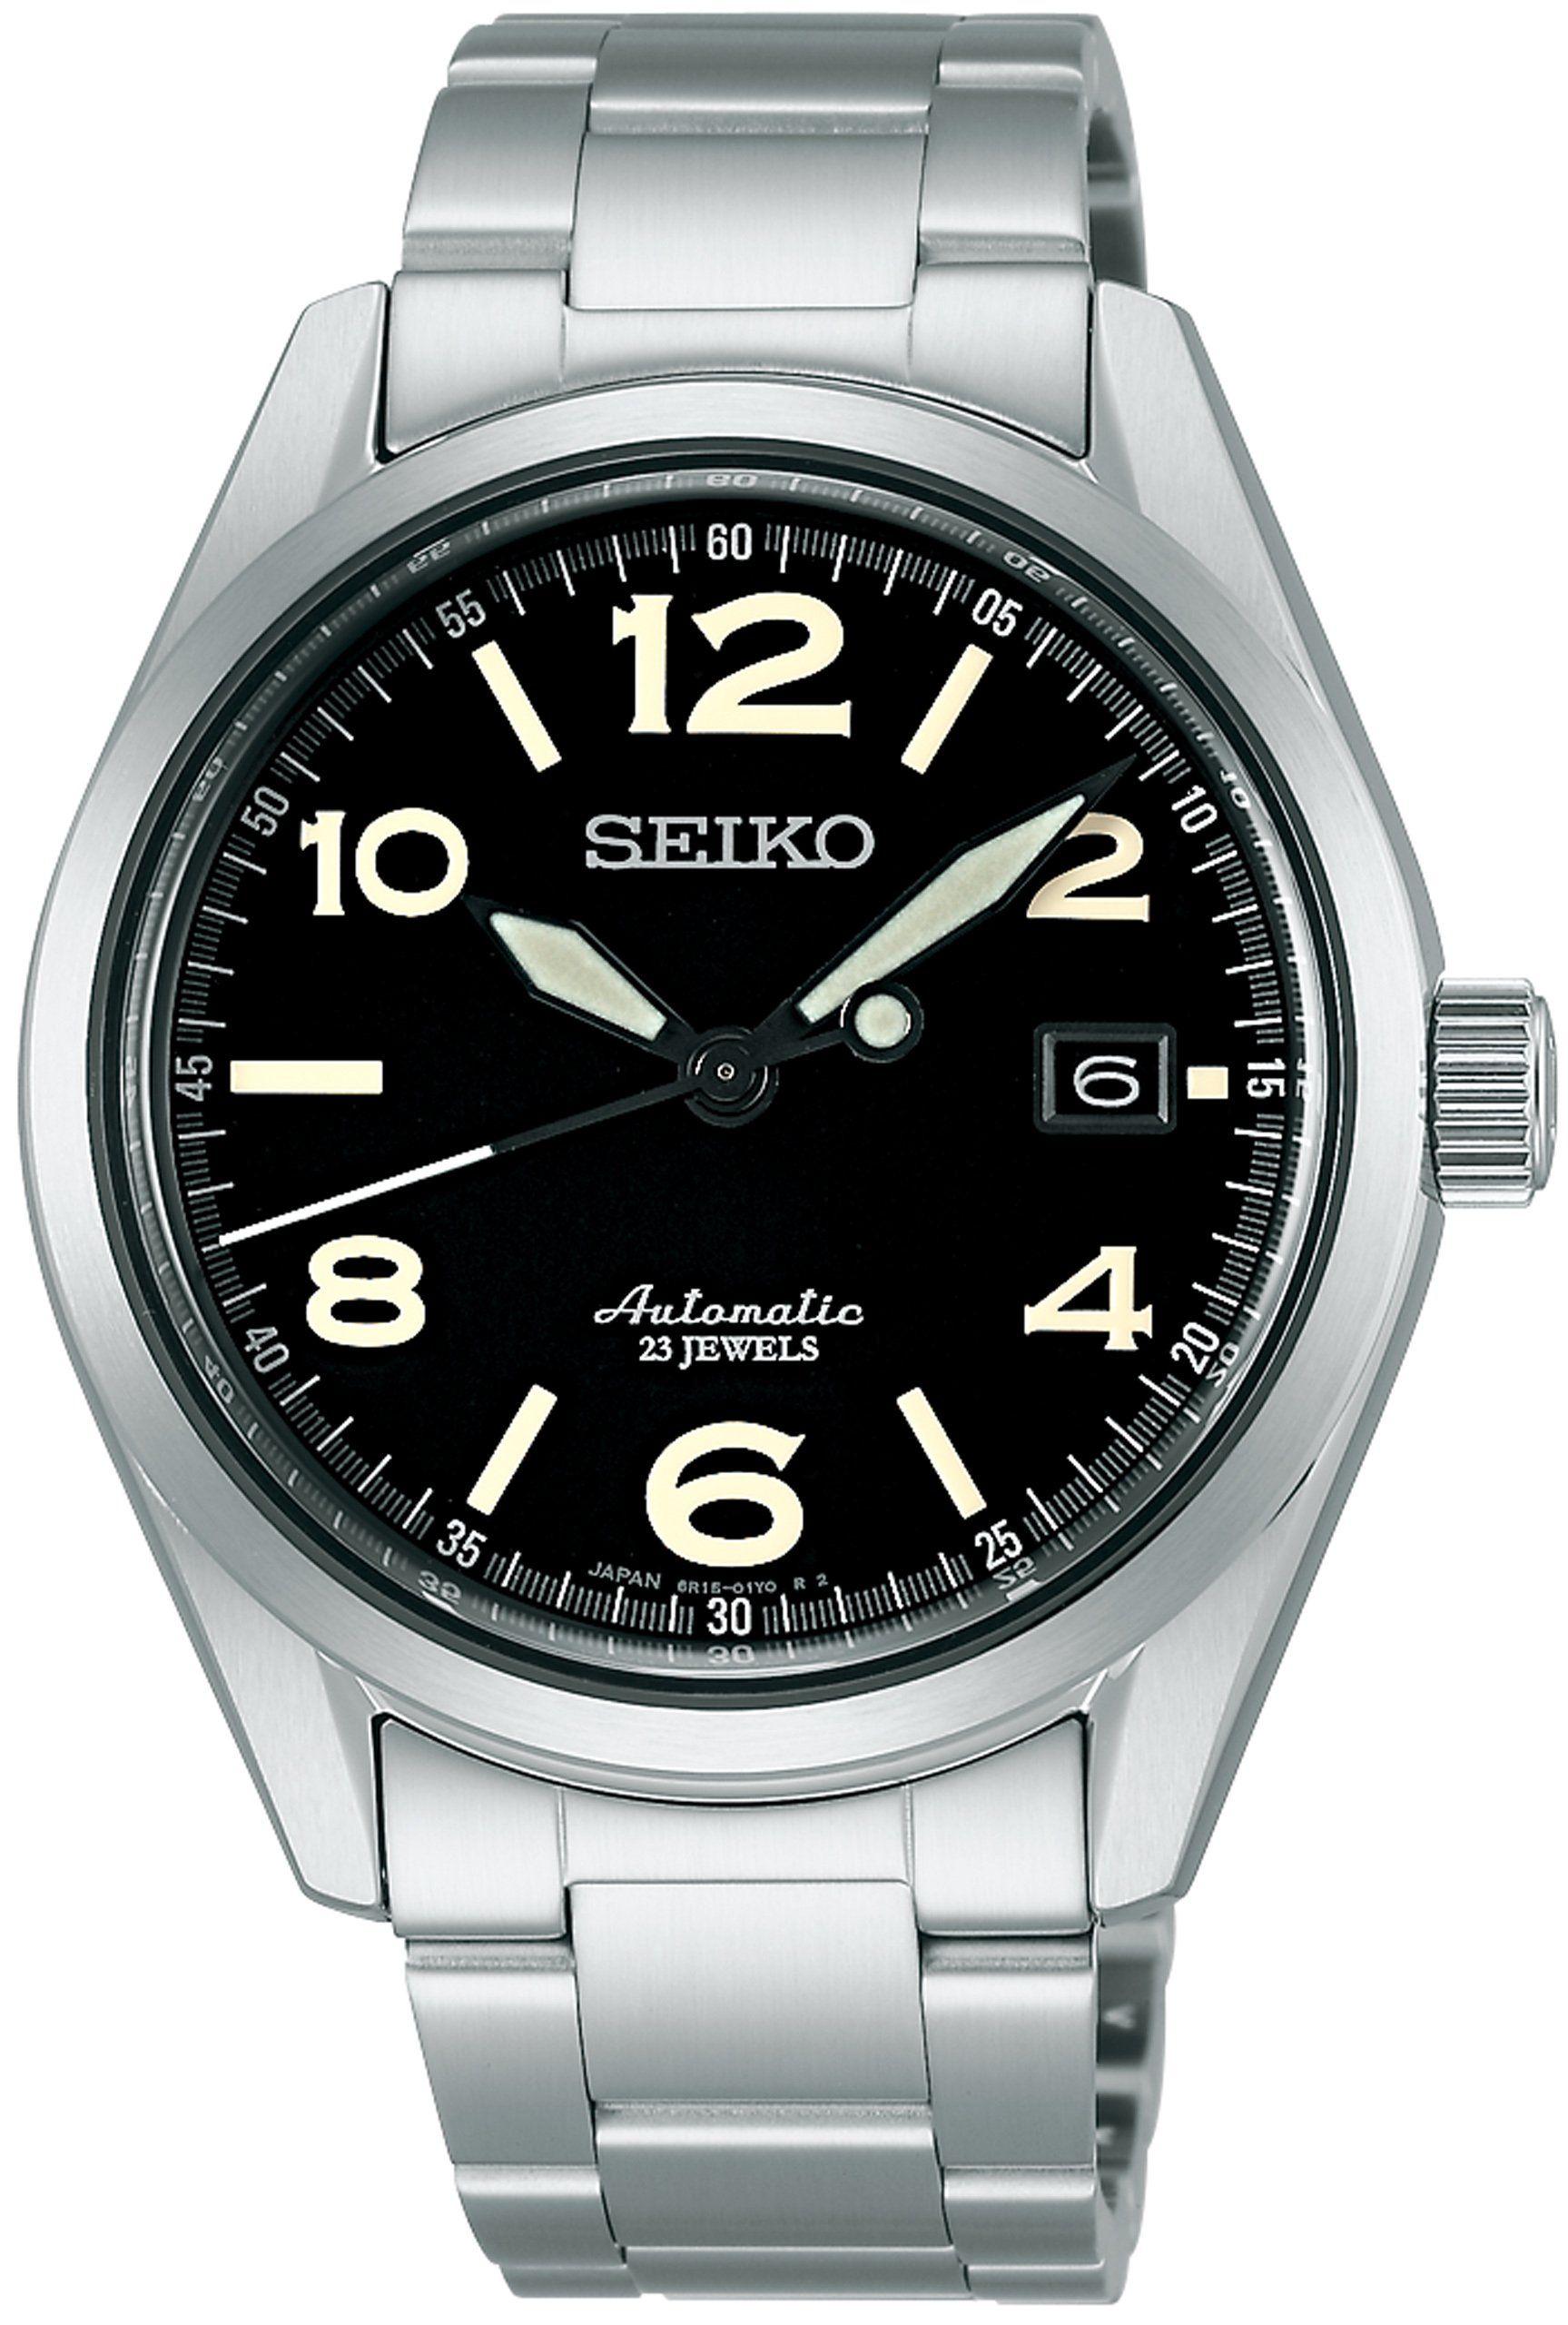 amazon com seiko watch mechanical automatic with manual winding rh pinterest com seiko 5 automatic watch manual Men's Automatic Watches